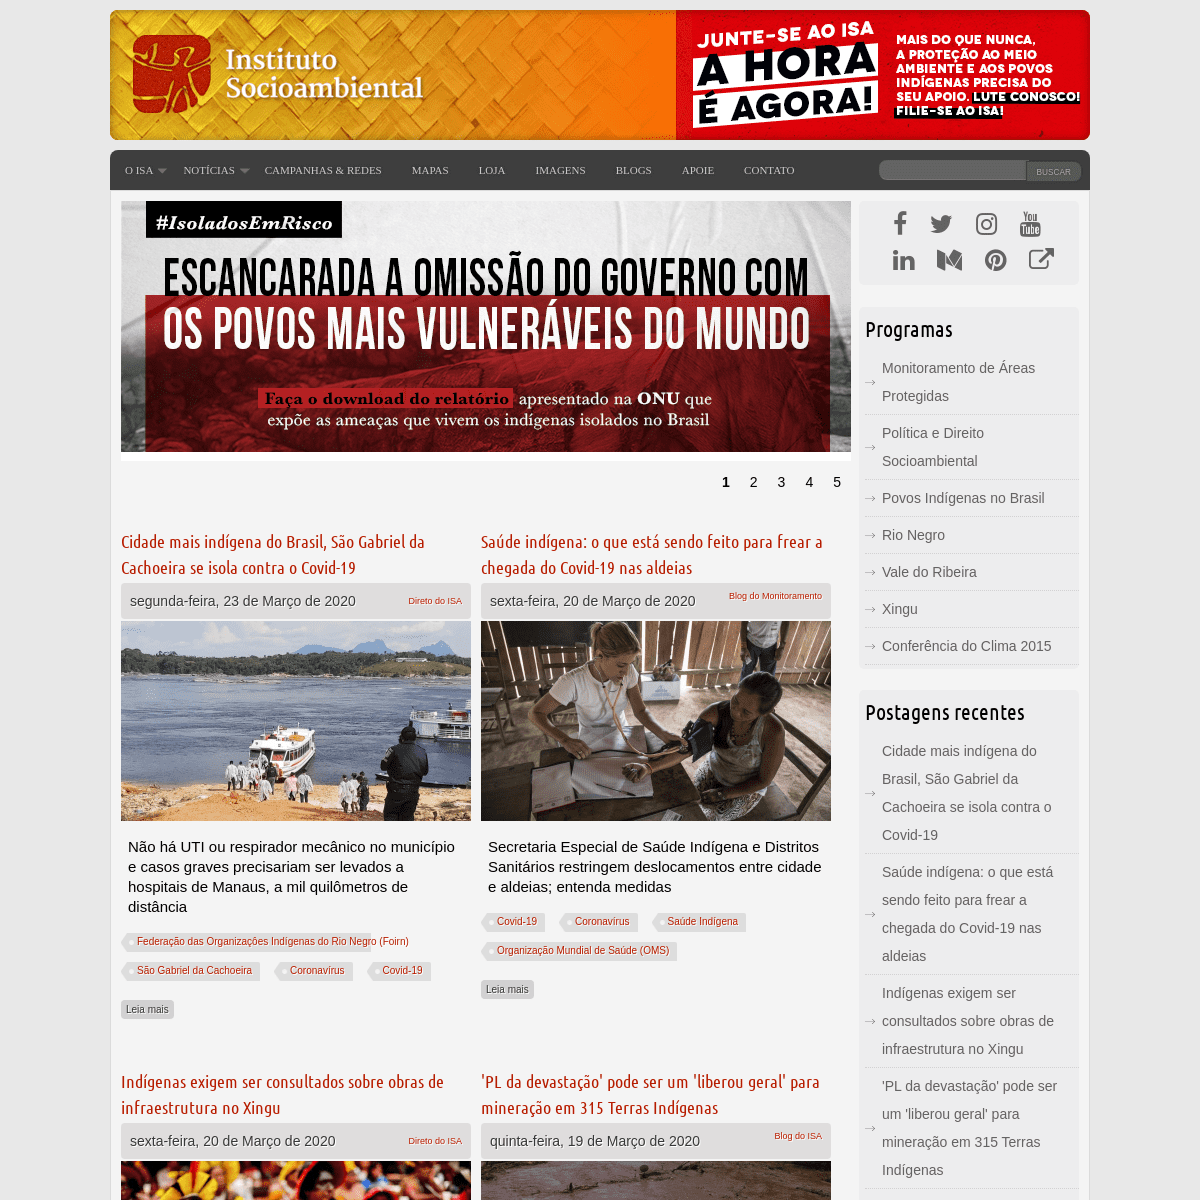 ArchiveBay.com - socioambiental.org - ISA - Instituto Socioambiental - Socioambiental se escreve junto...